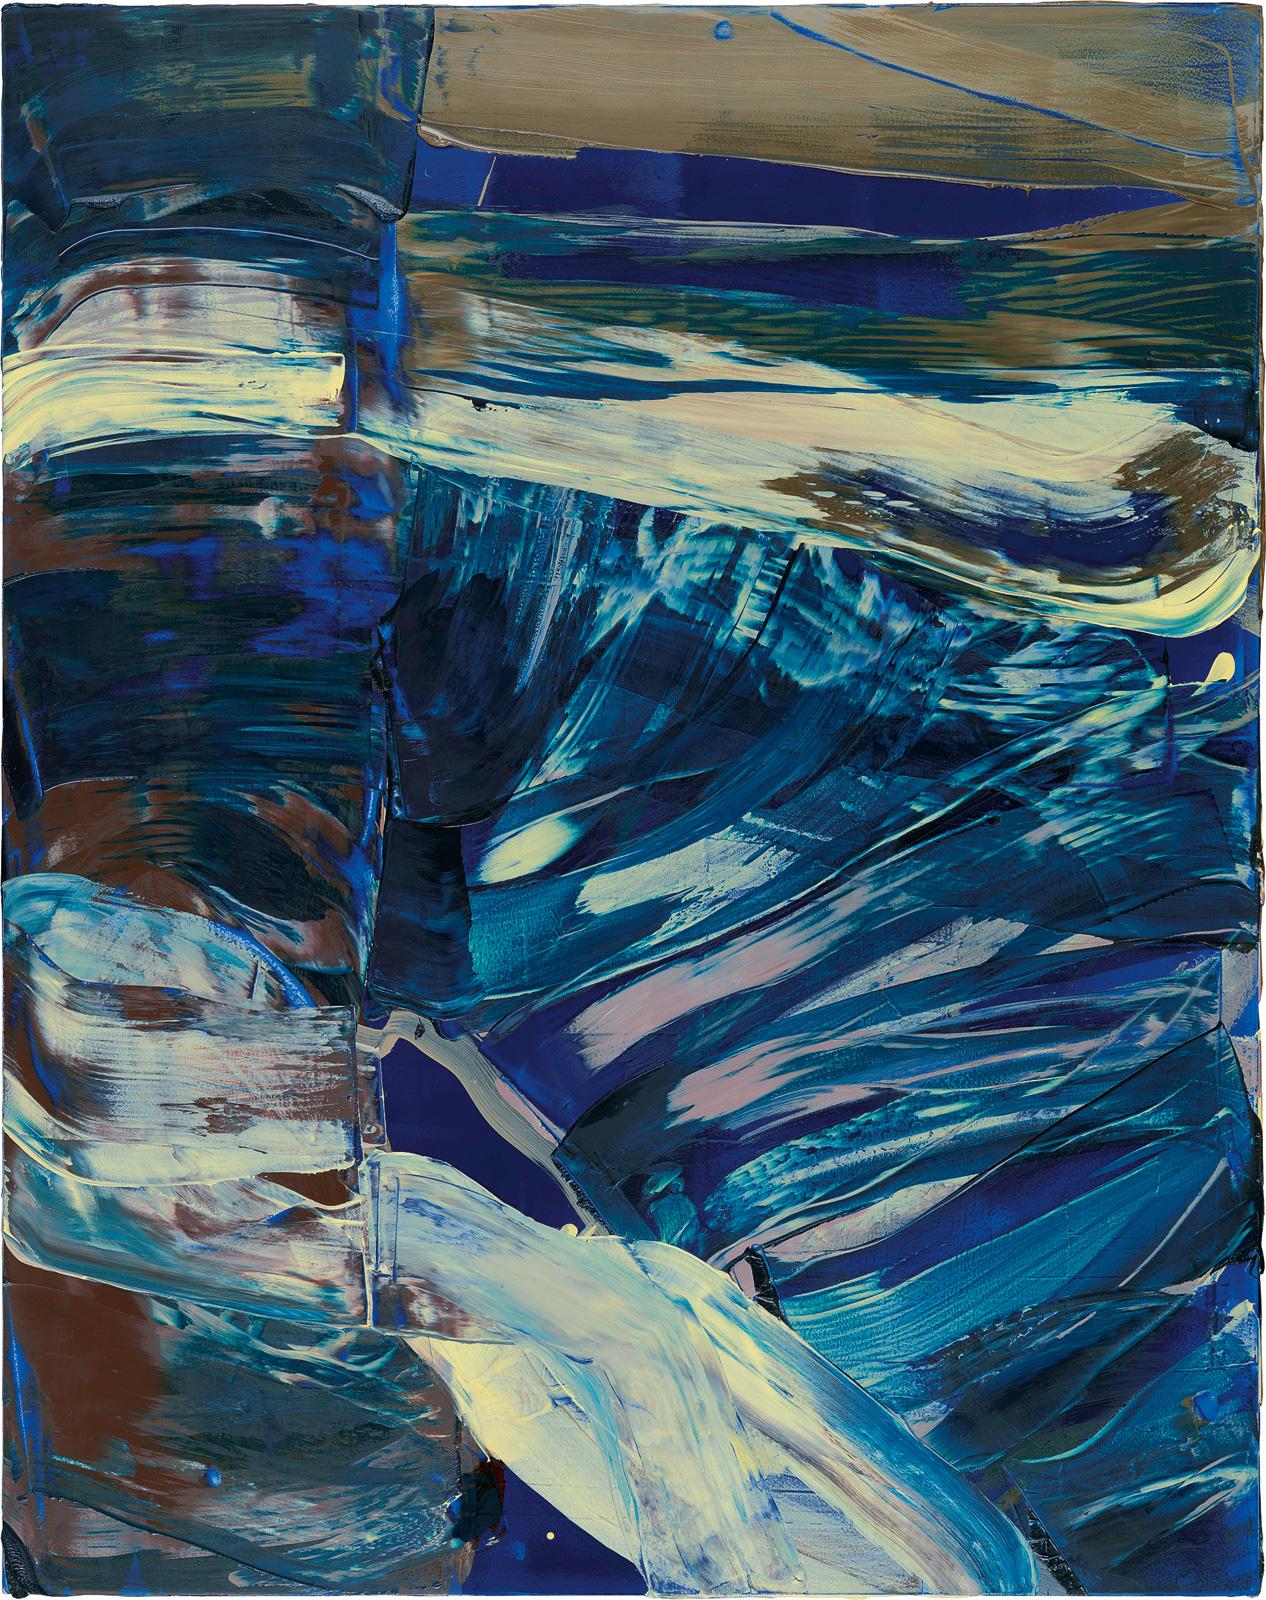 Blaubuche, 2013, Öl auf Holz, 95x75cm